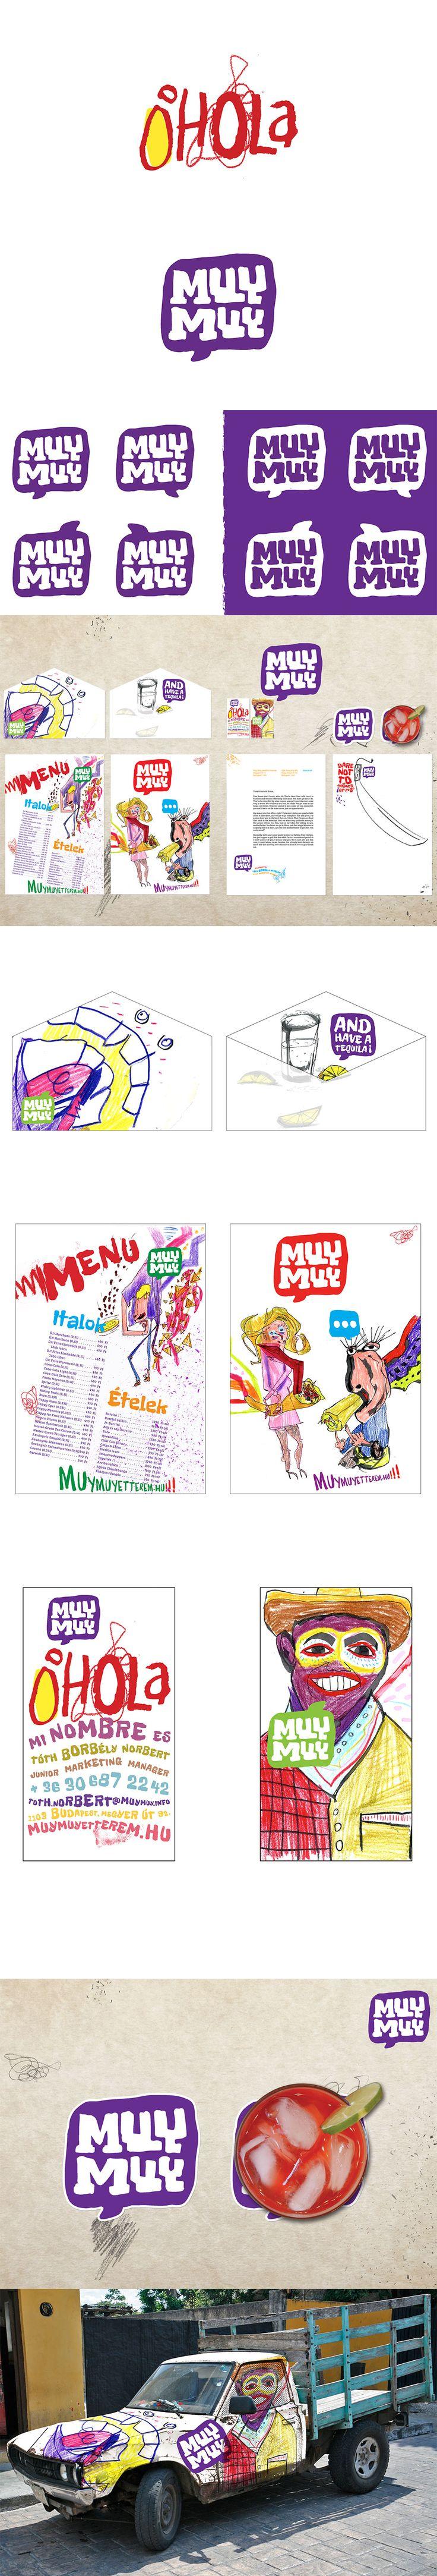 Illustrative colorful brand identity logo mexican restaurant https://www.behance.net/laszloaronboncz